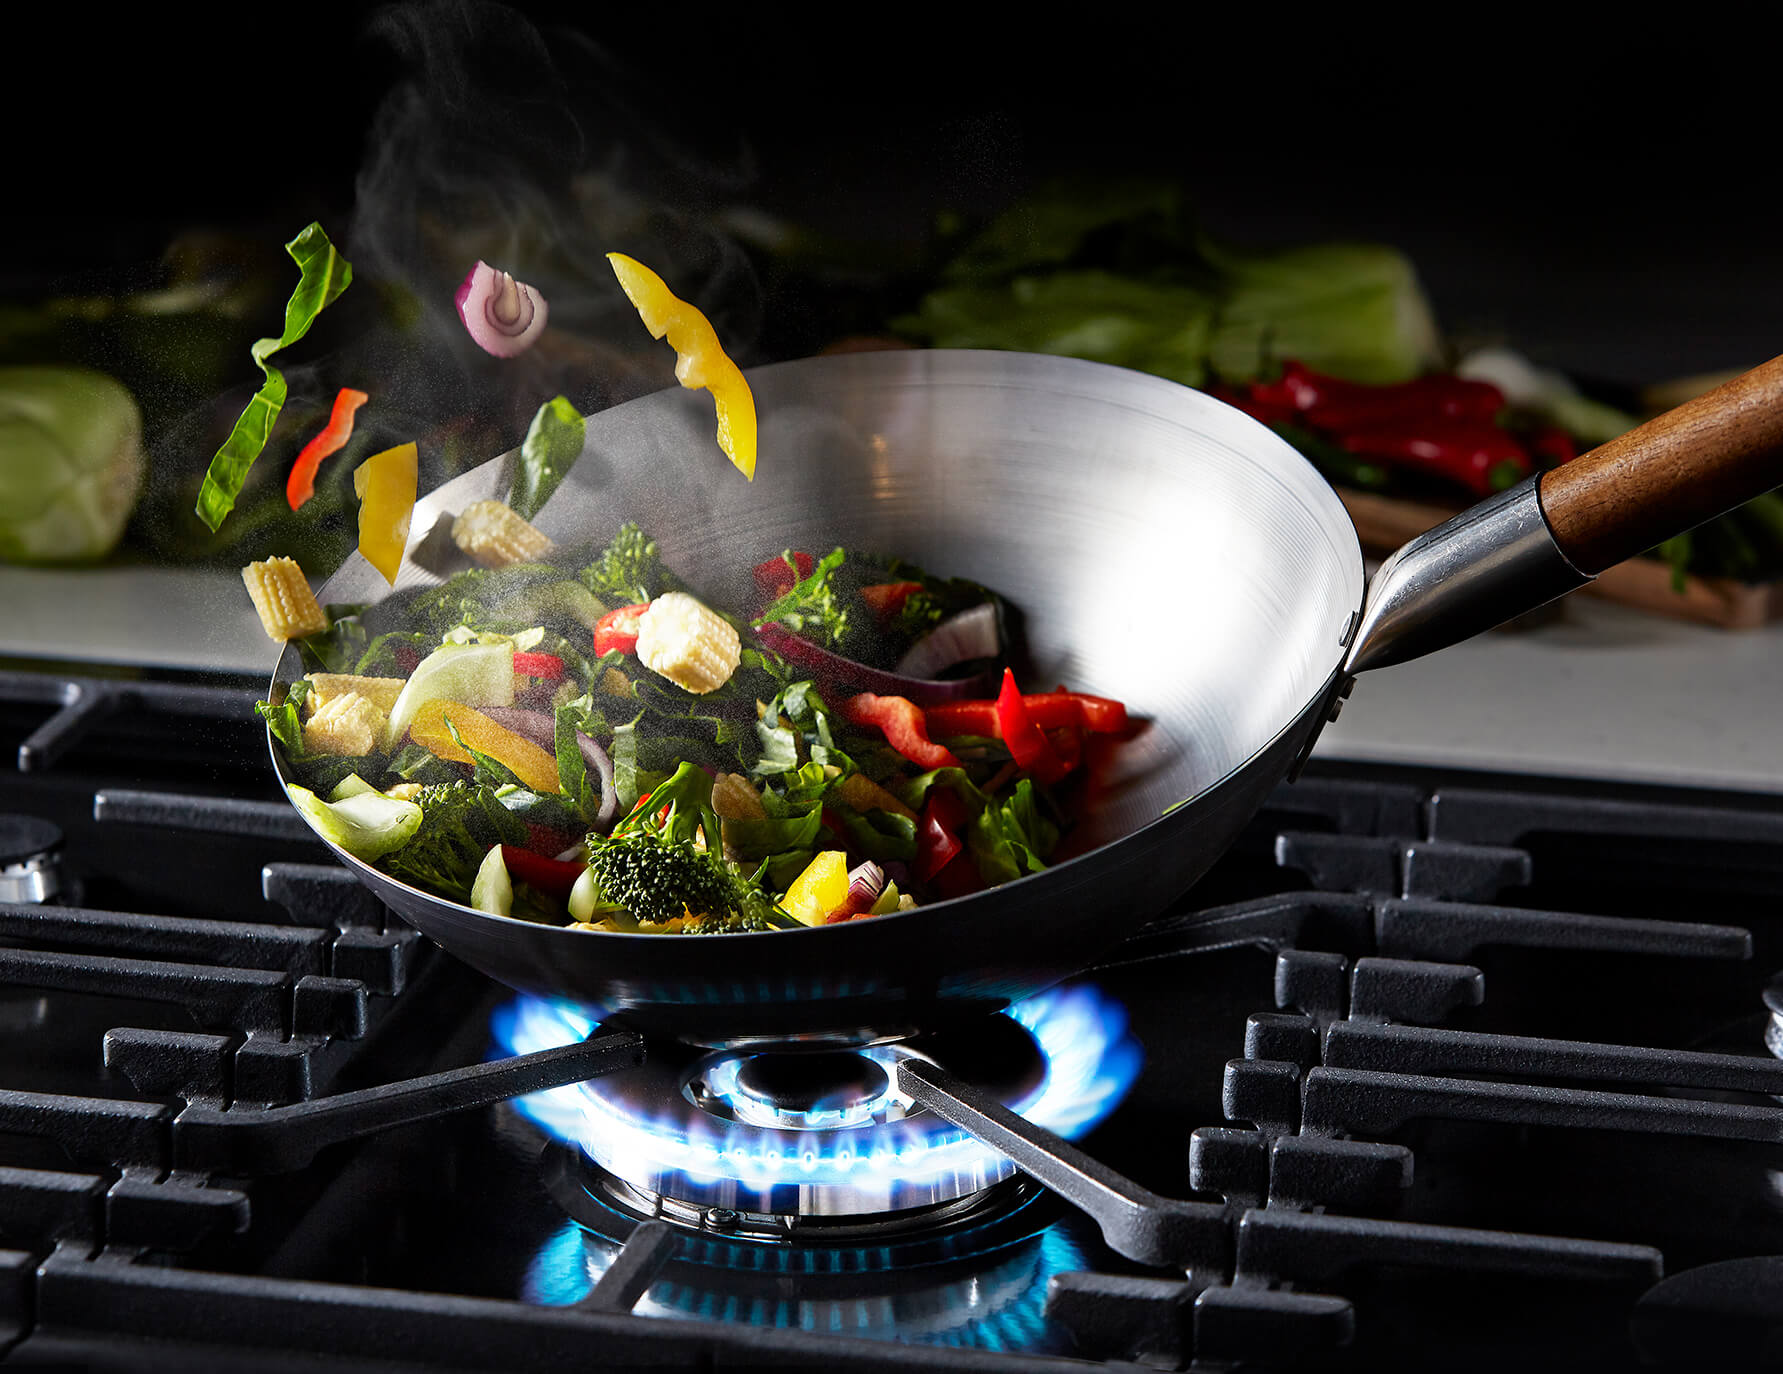 stoves stir fry